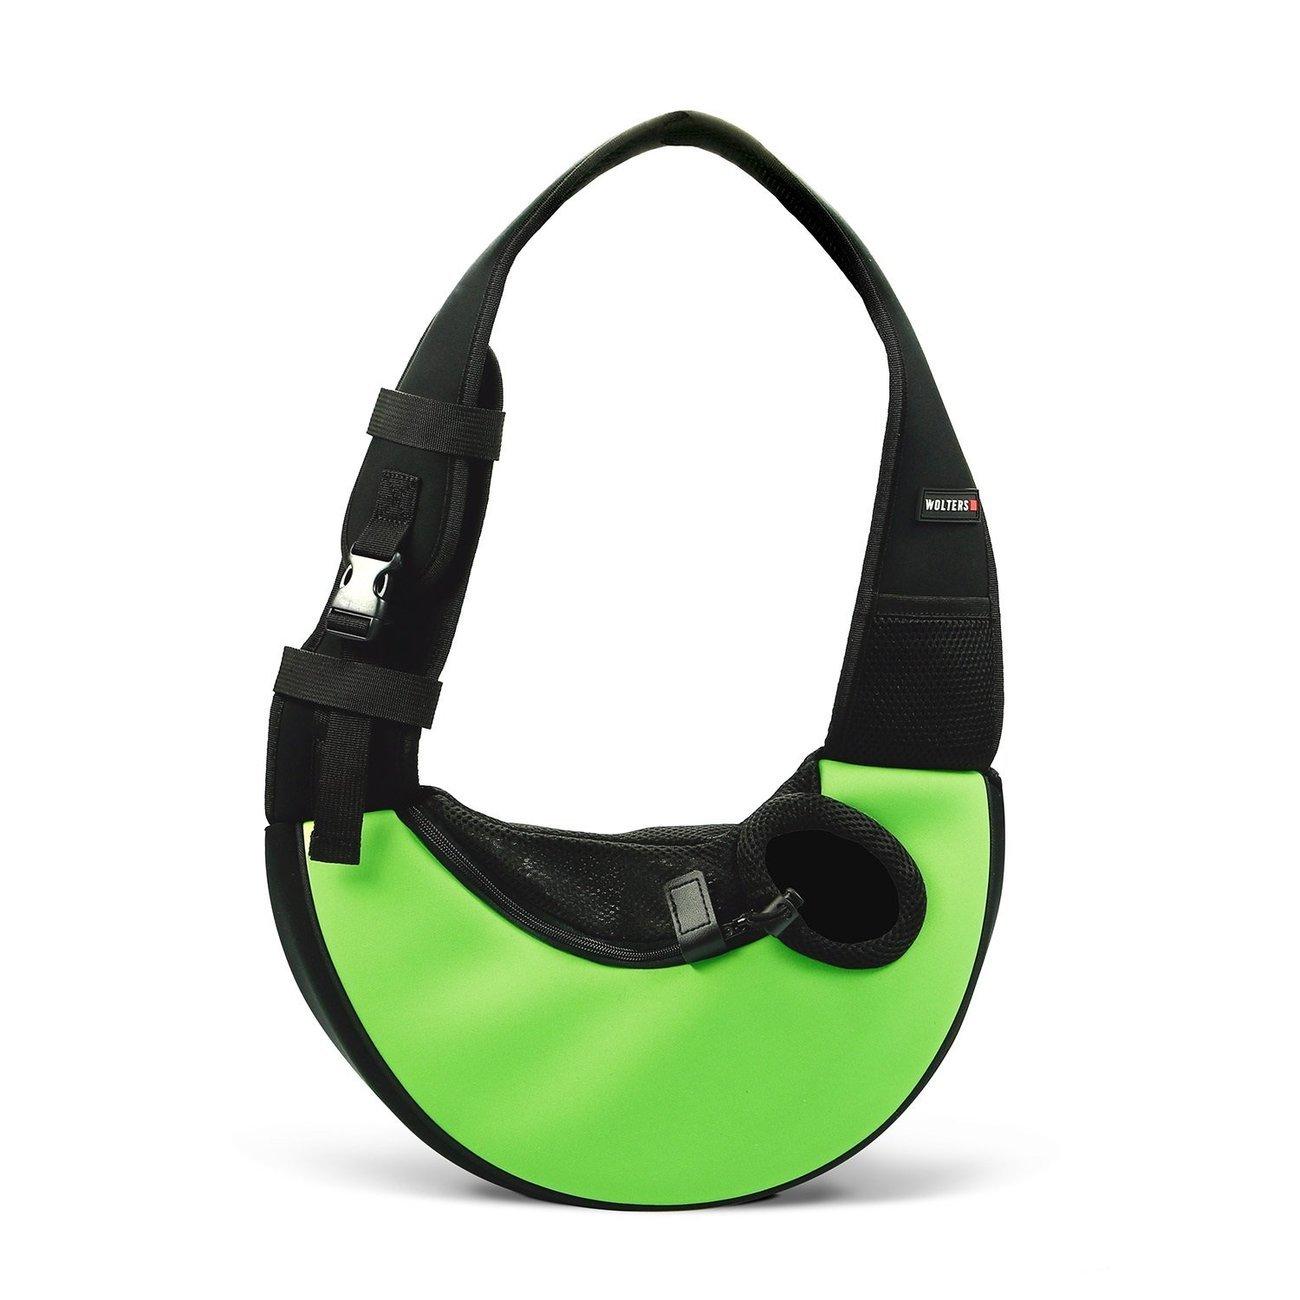 Wolters Schultertasche Hund Bodypack Neoprino